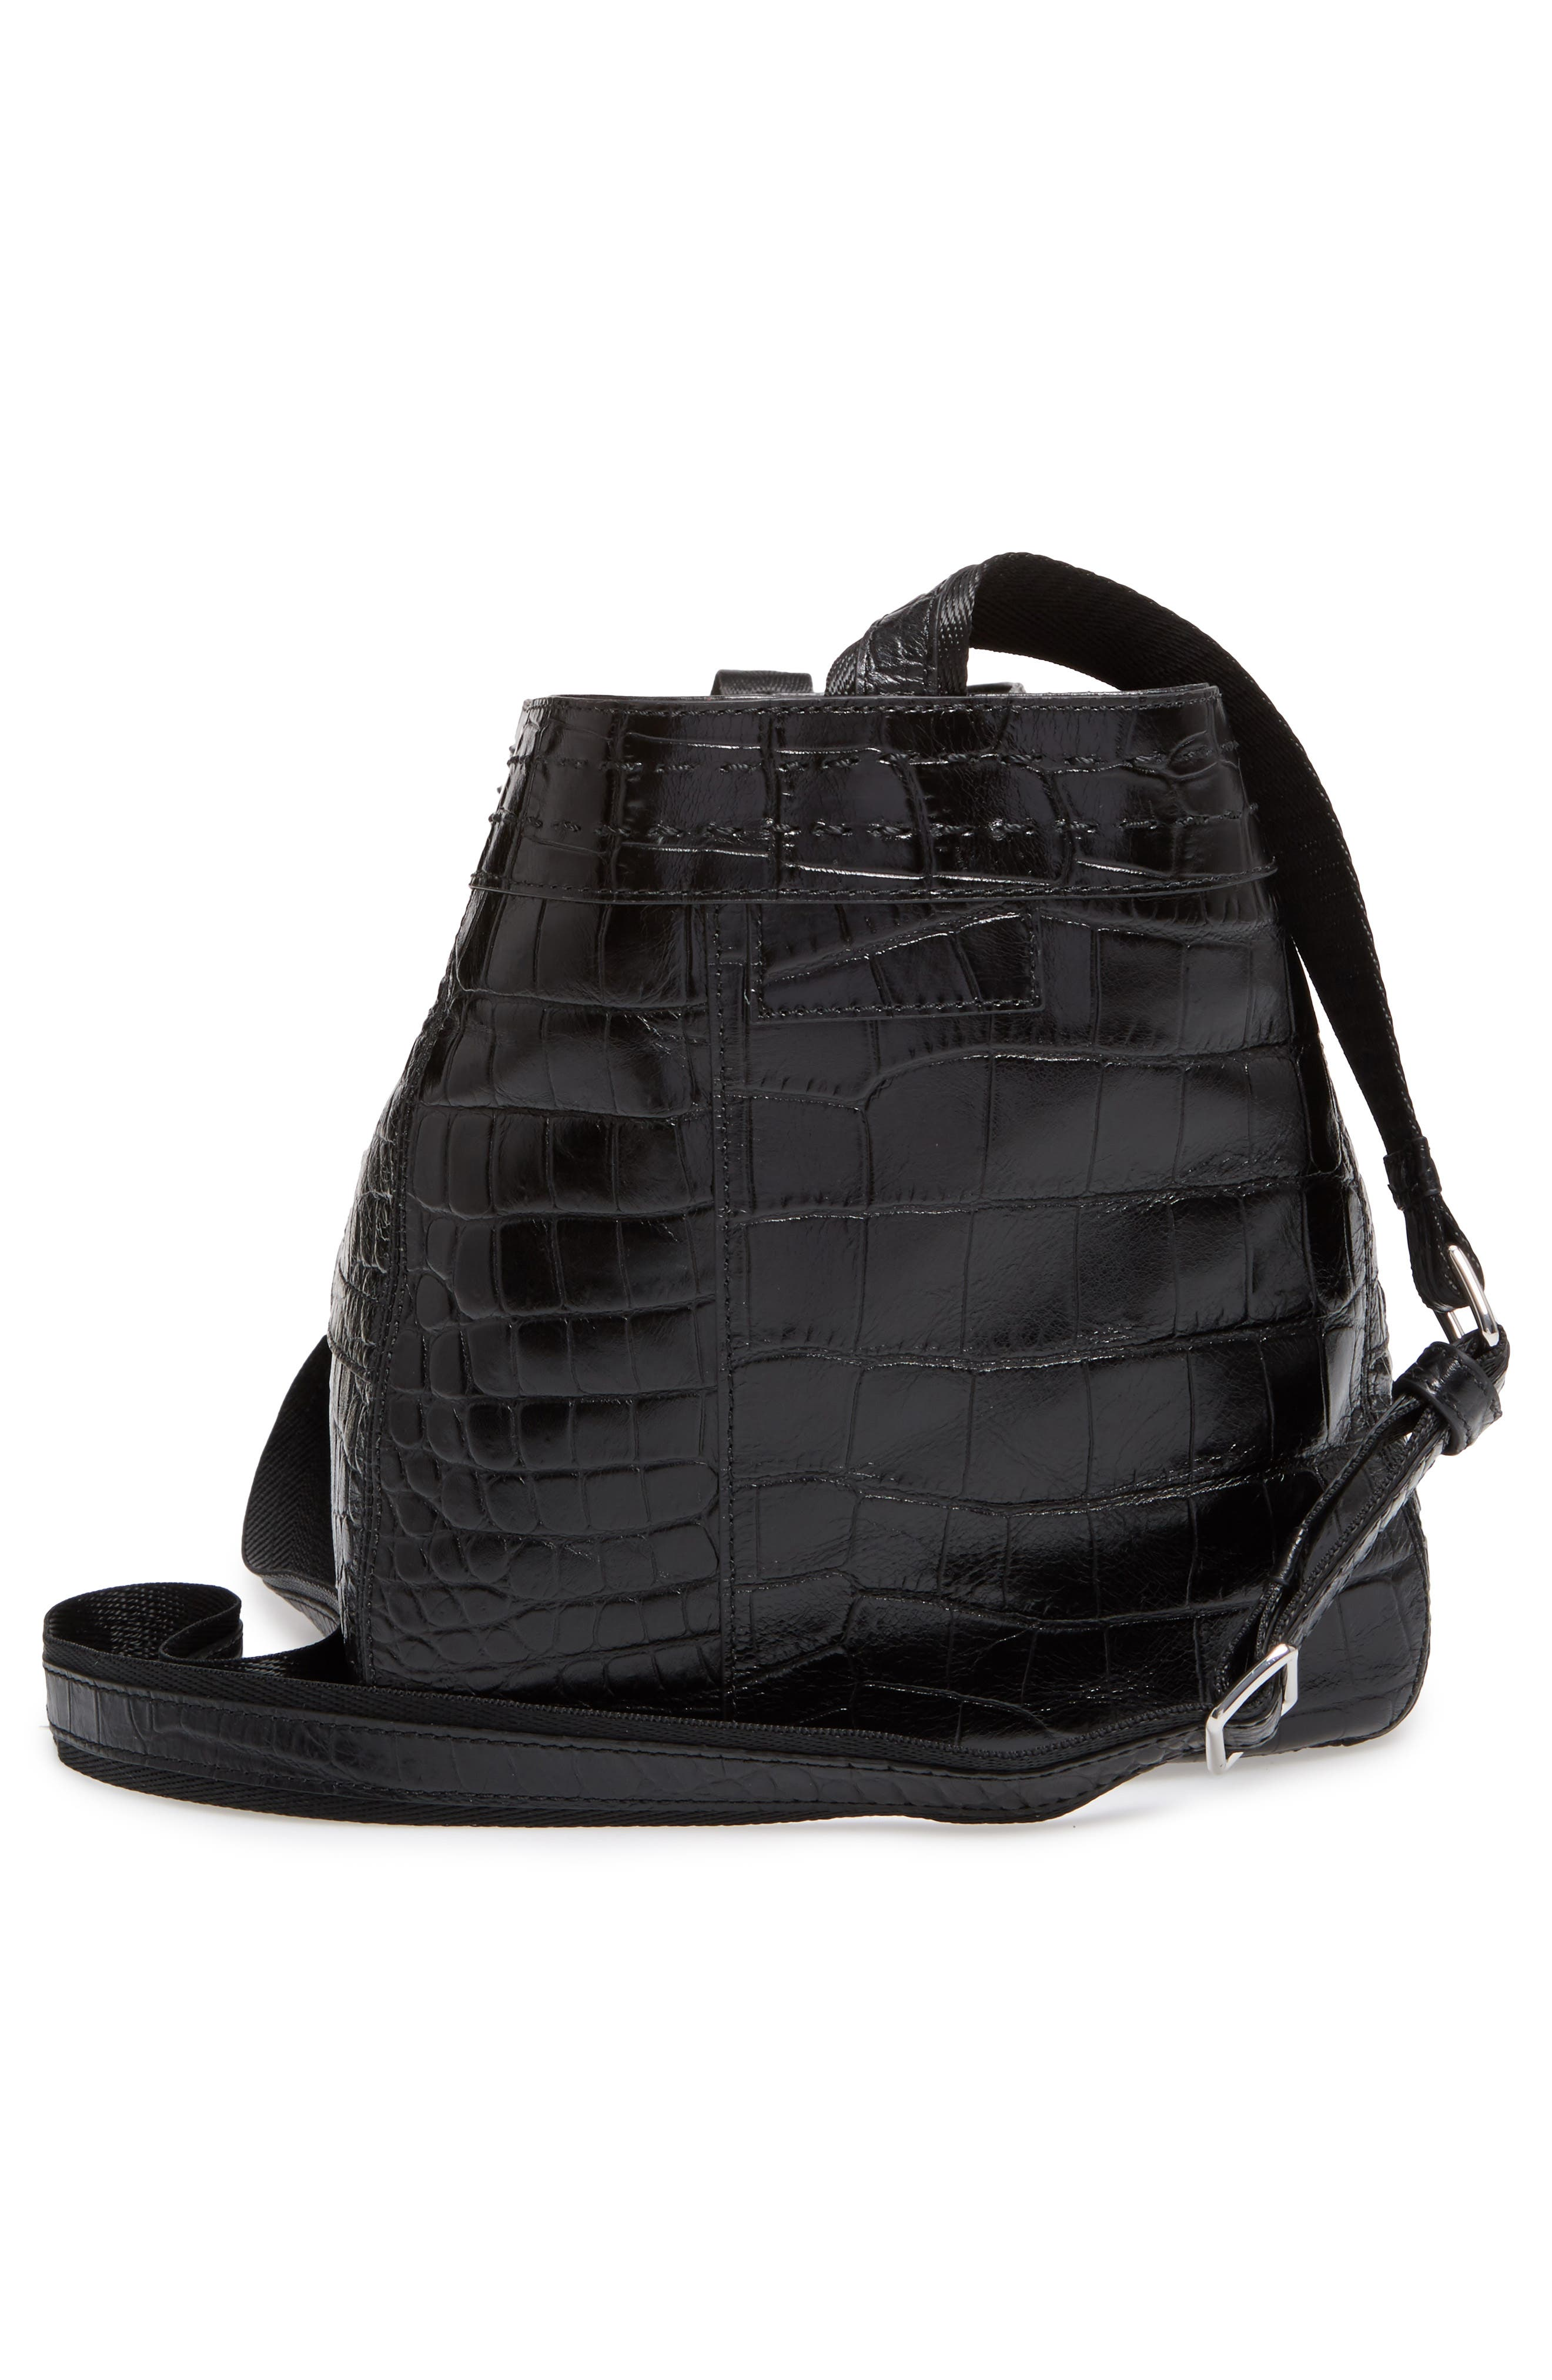 Mini Keely Newspaper Croc Embossed Leather Shoulder/Crossbody Bag,                             Alternate thumbnail 5, color,                             001